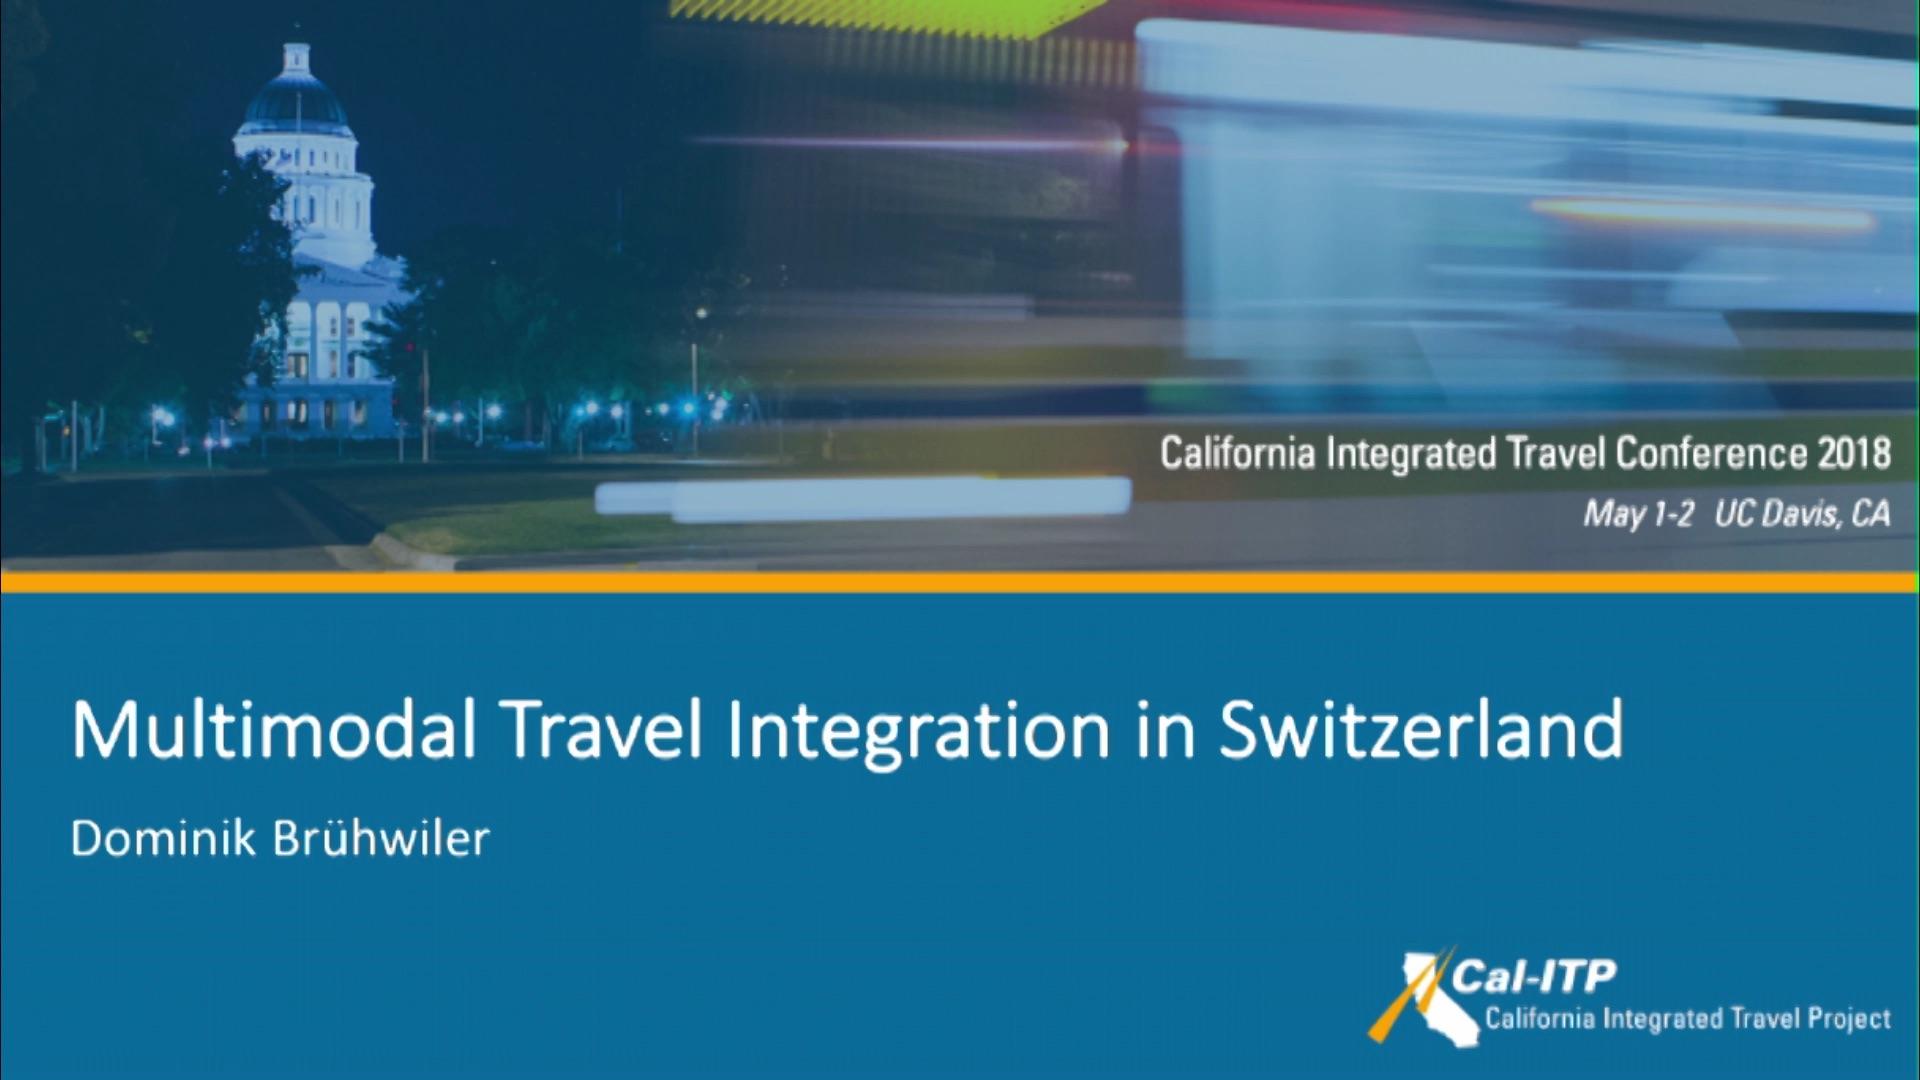 12. Multimodal Travel in Switzerland